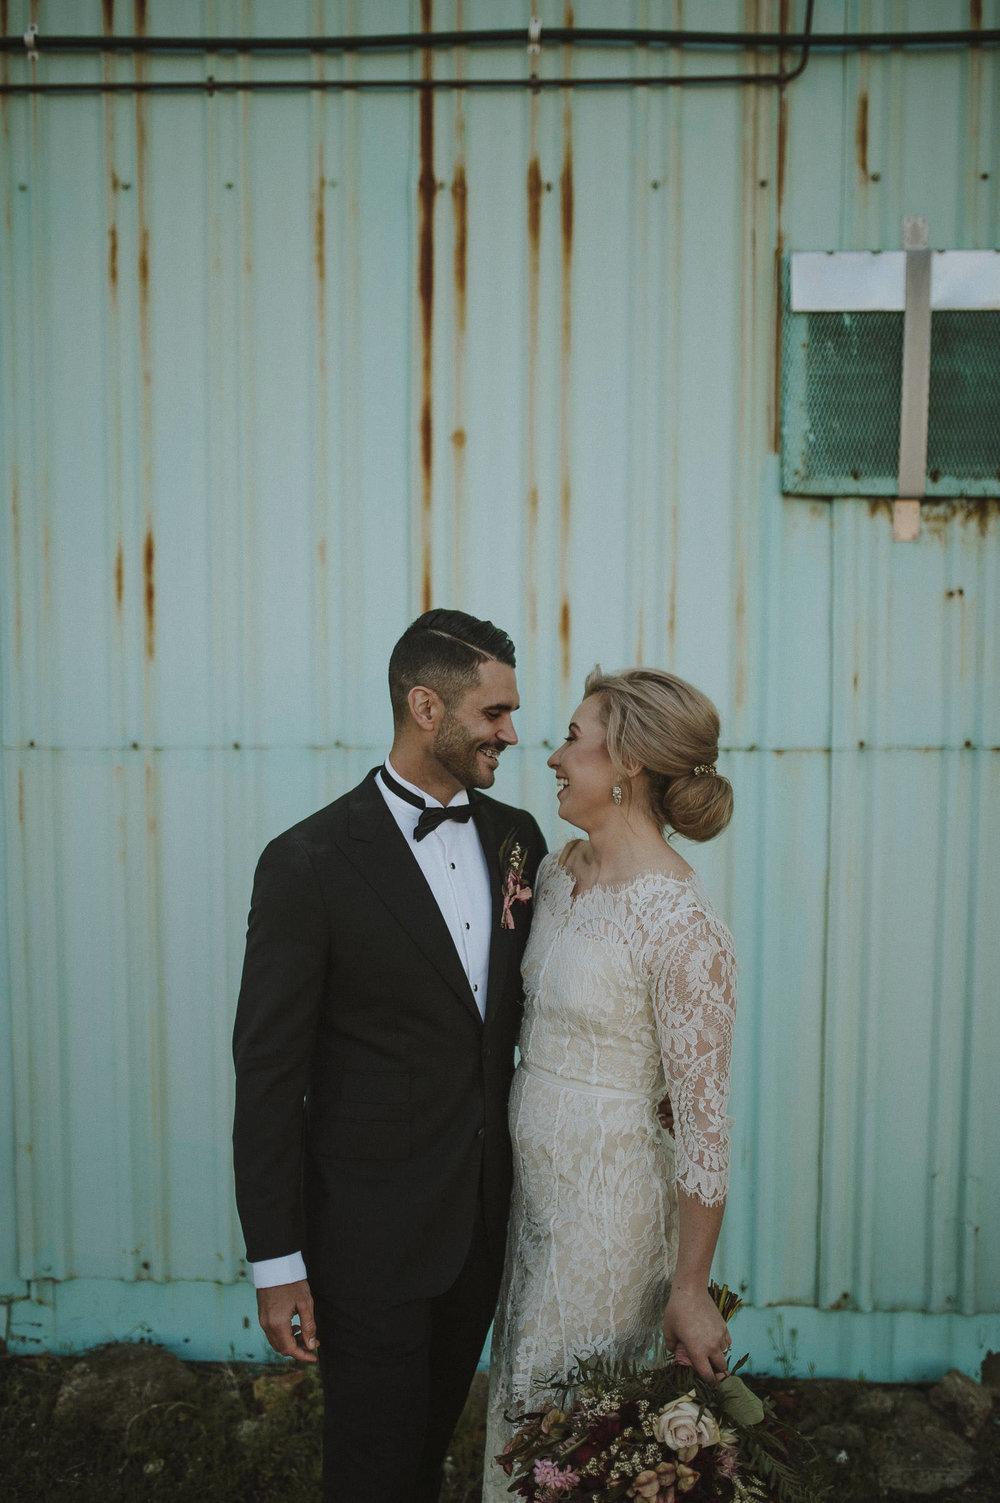 Joel_Laura_Newcastle_Wedding_Blog-43.jpg